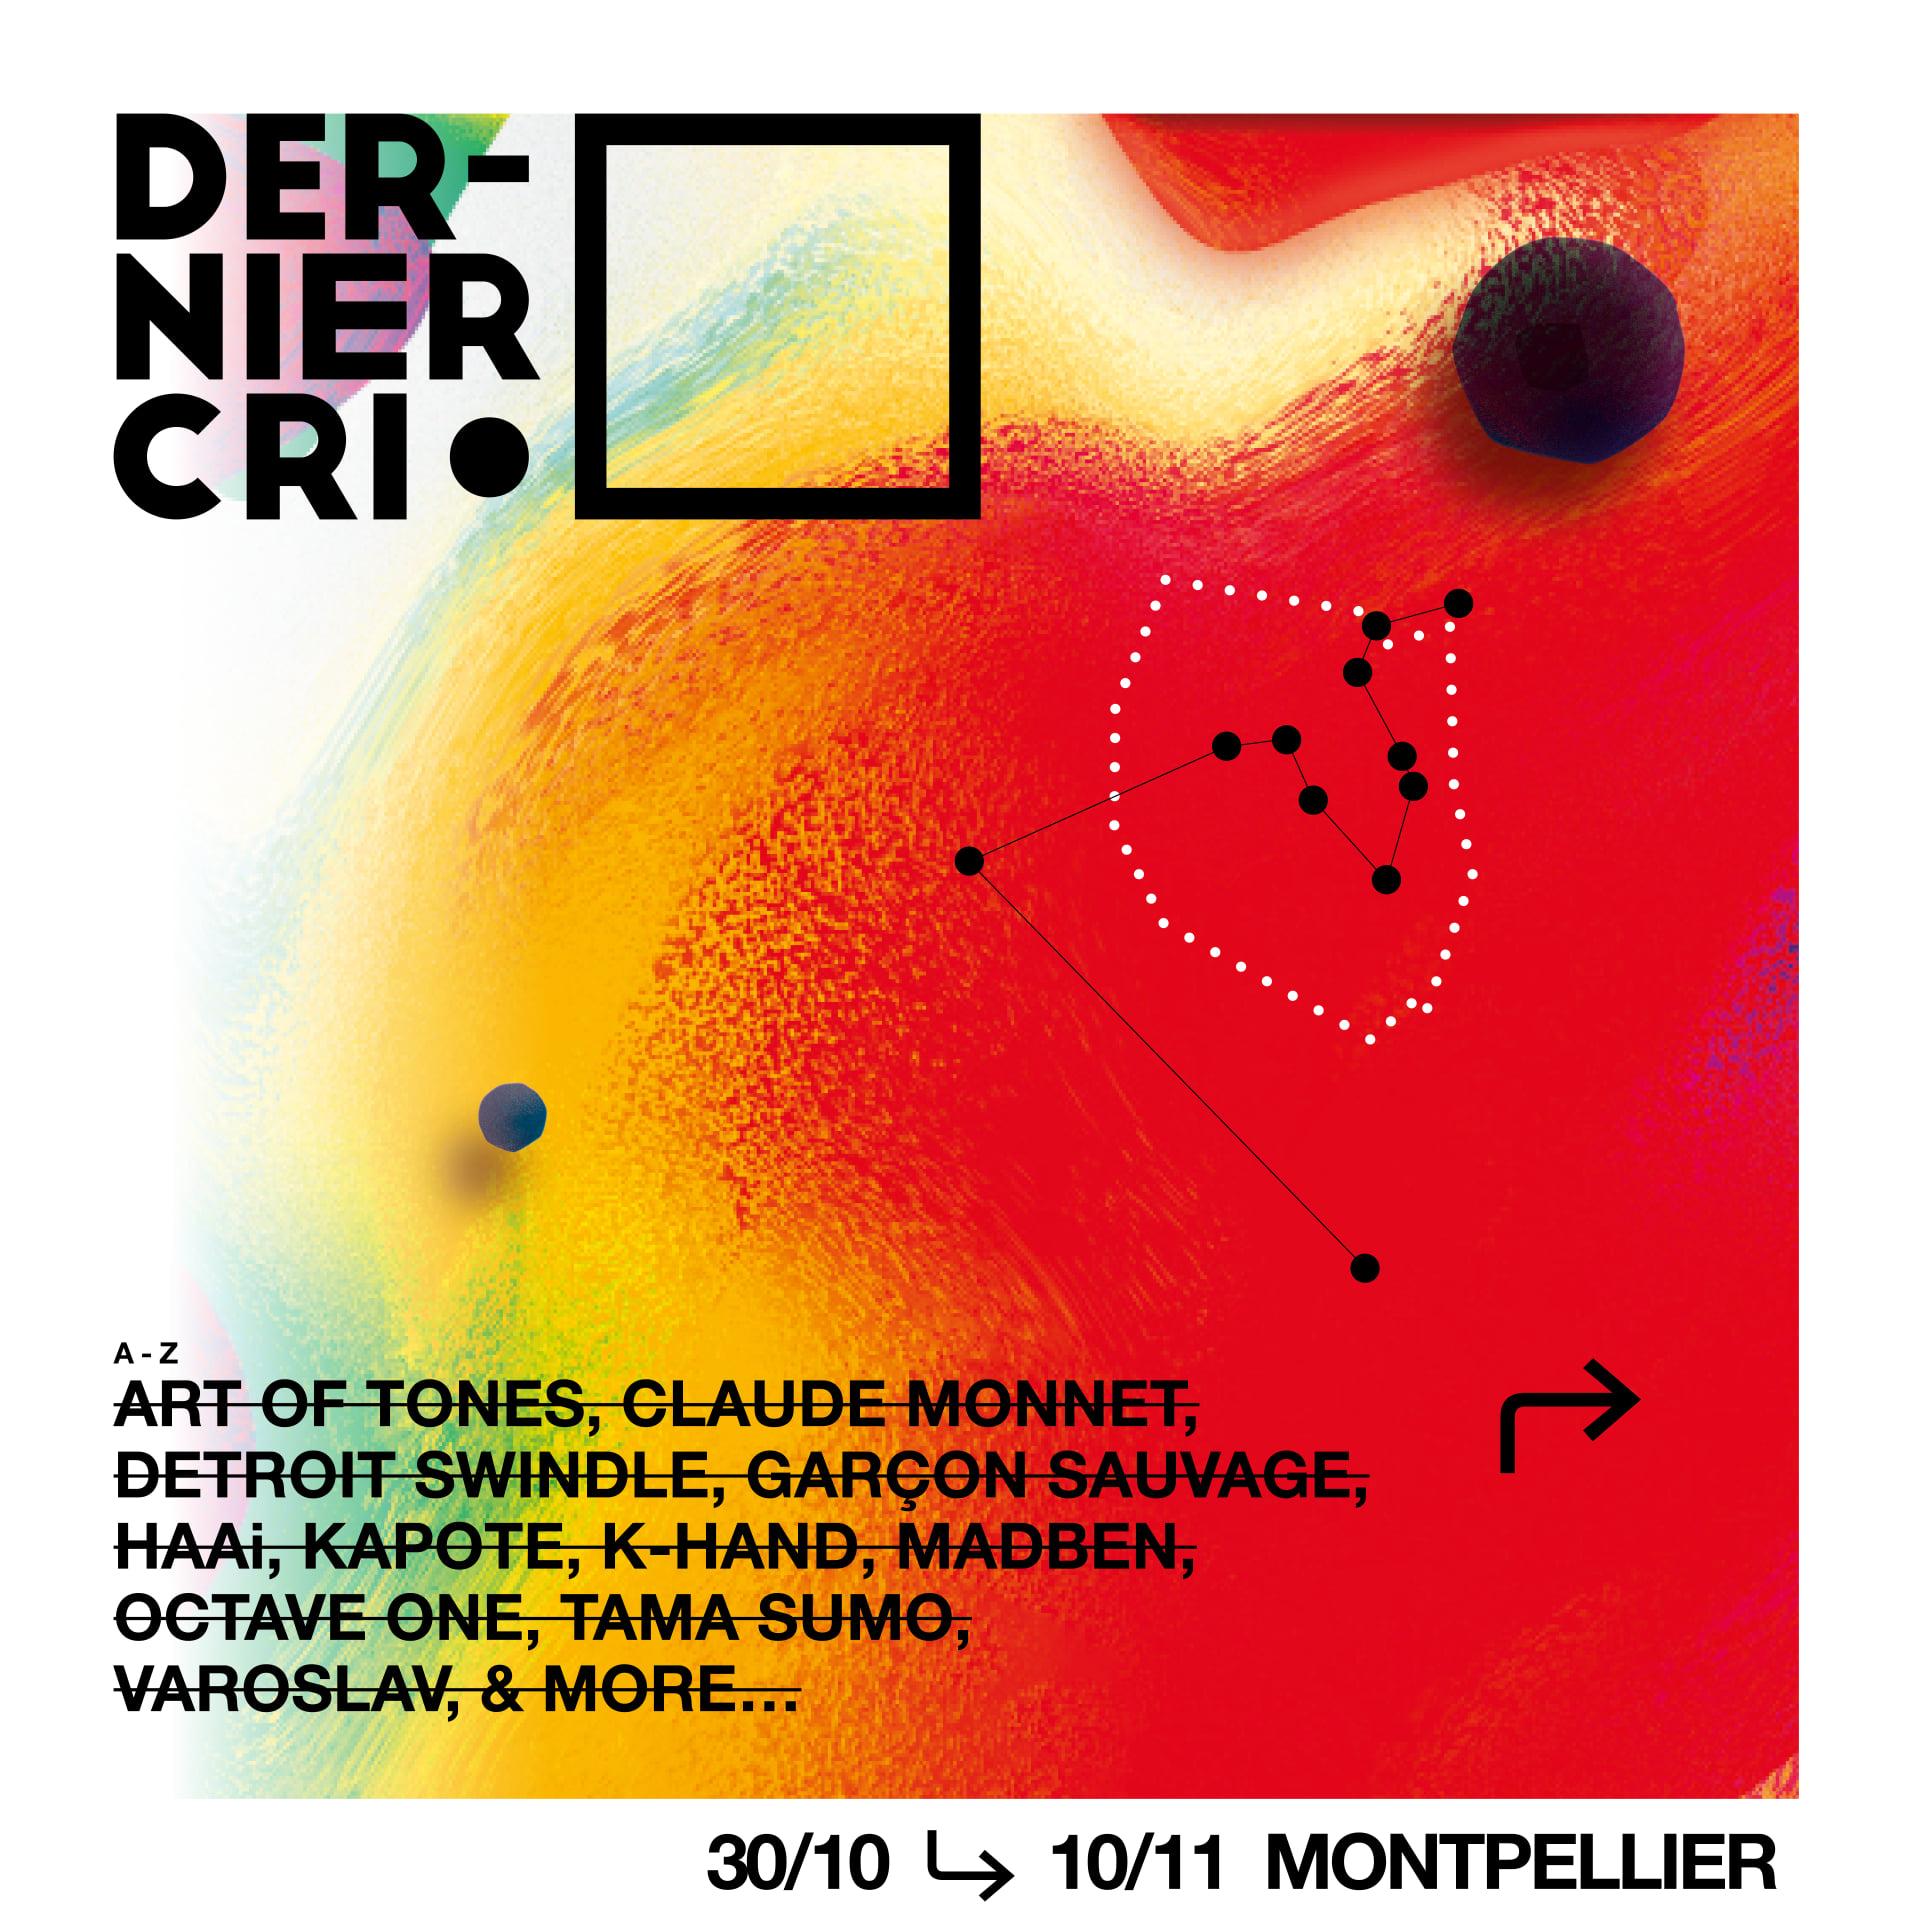 Festival Dernier Cri 2019